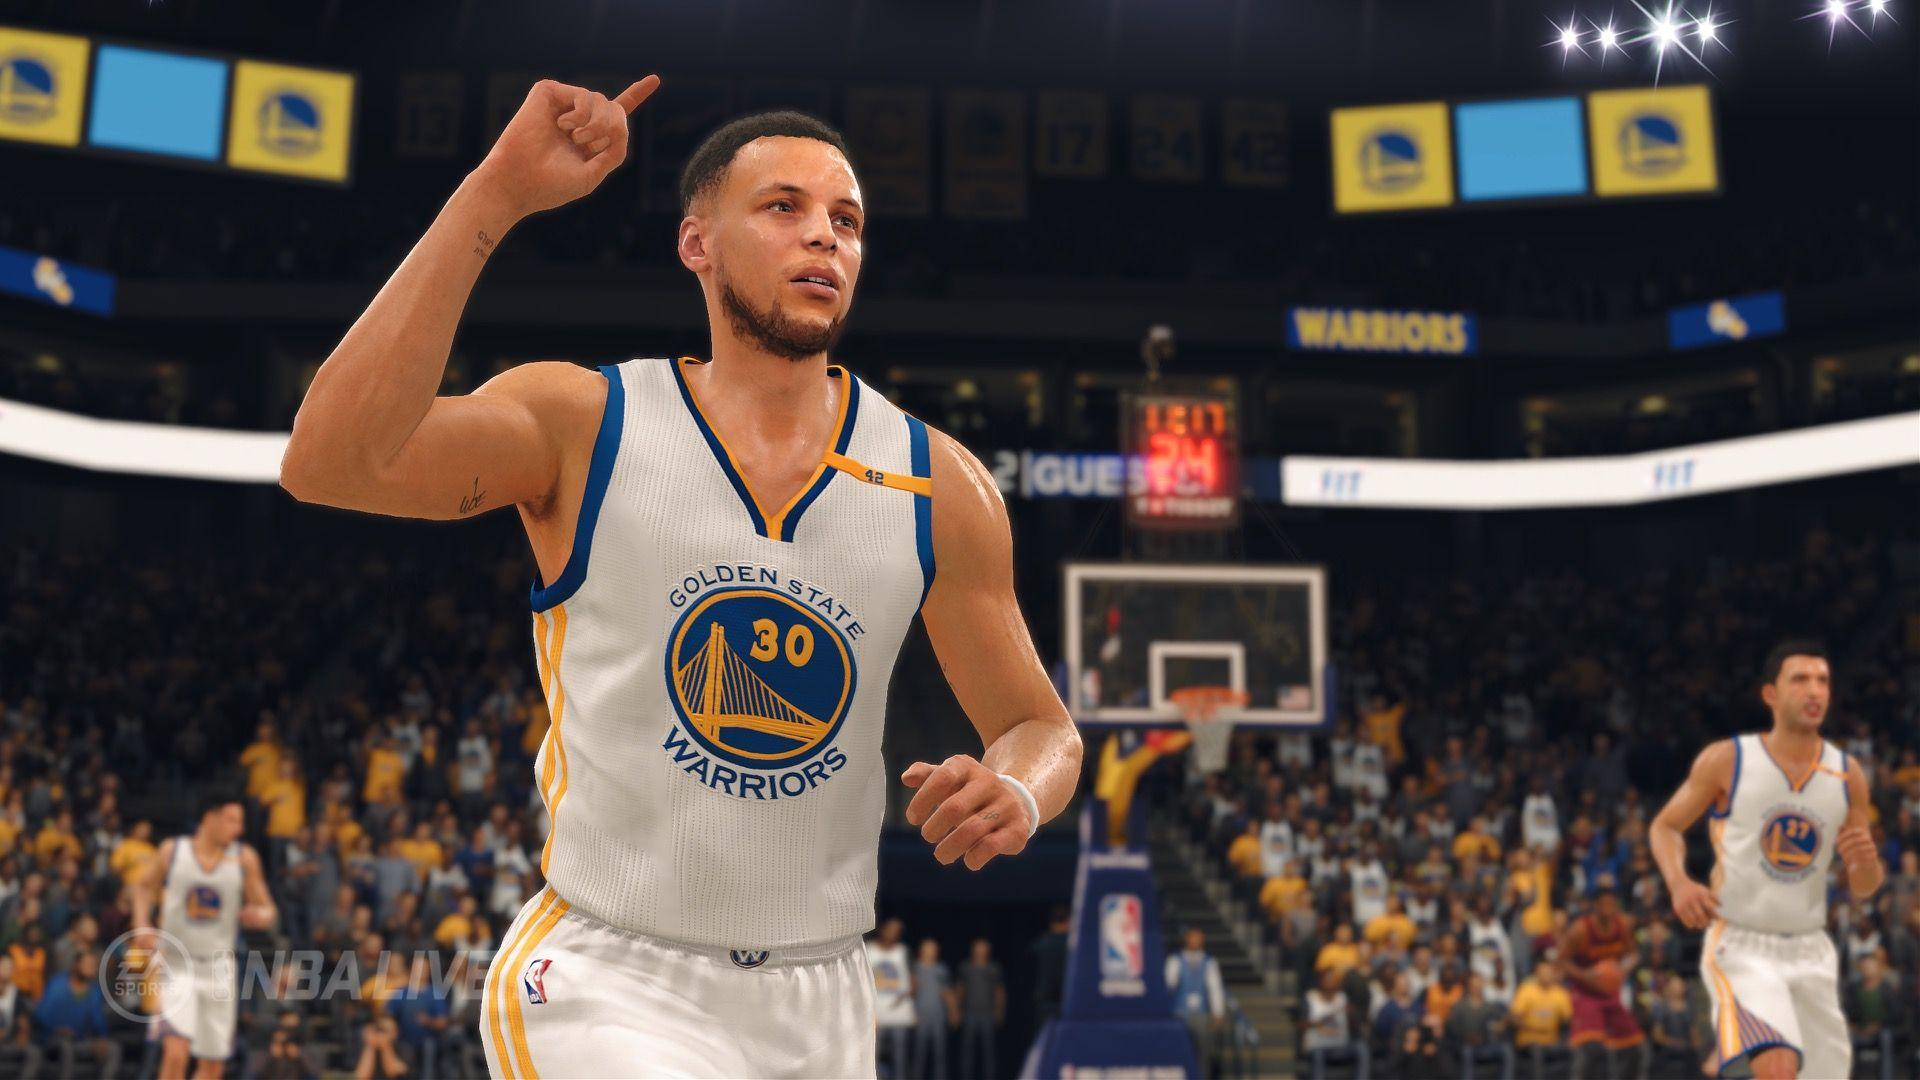 NLSC Forum • NBA Live 18. First Reveal